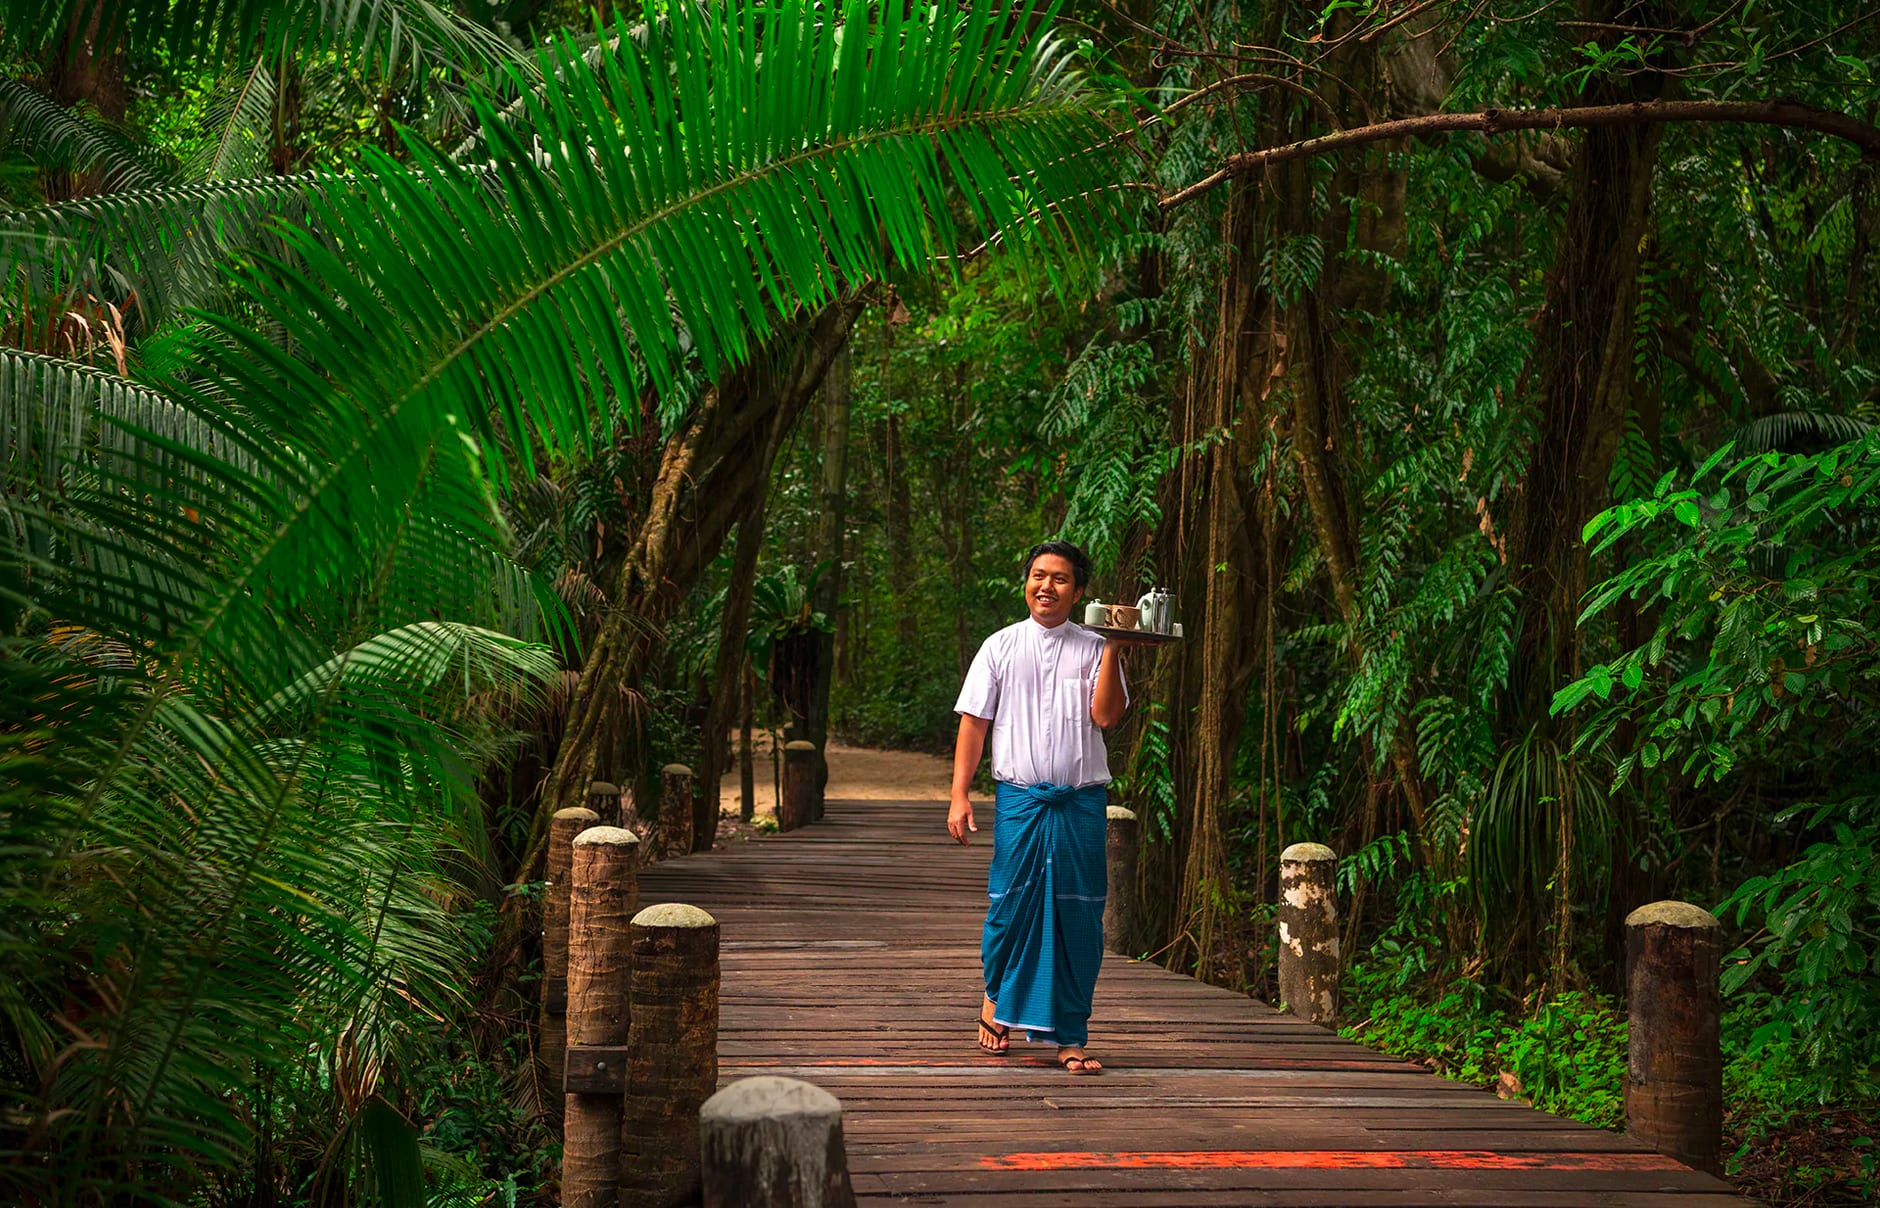 Wa Ale Island Resort, Myeik Archipelago, Myanmar. © Wa Ale Island Resort